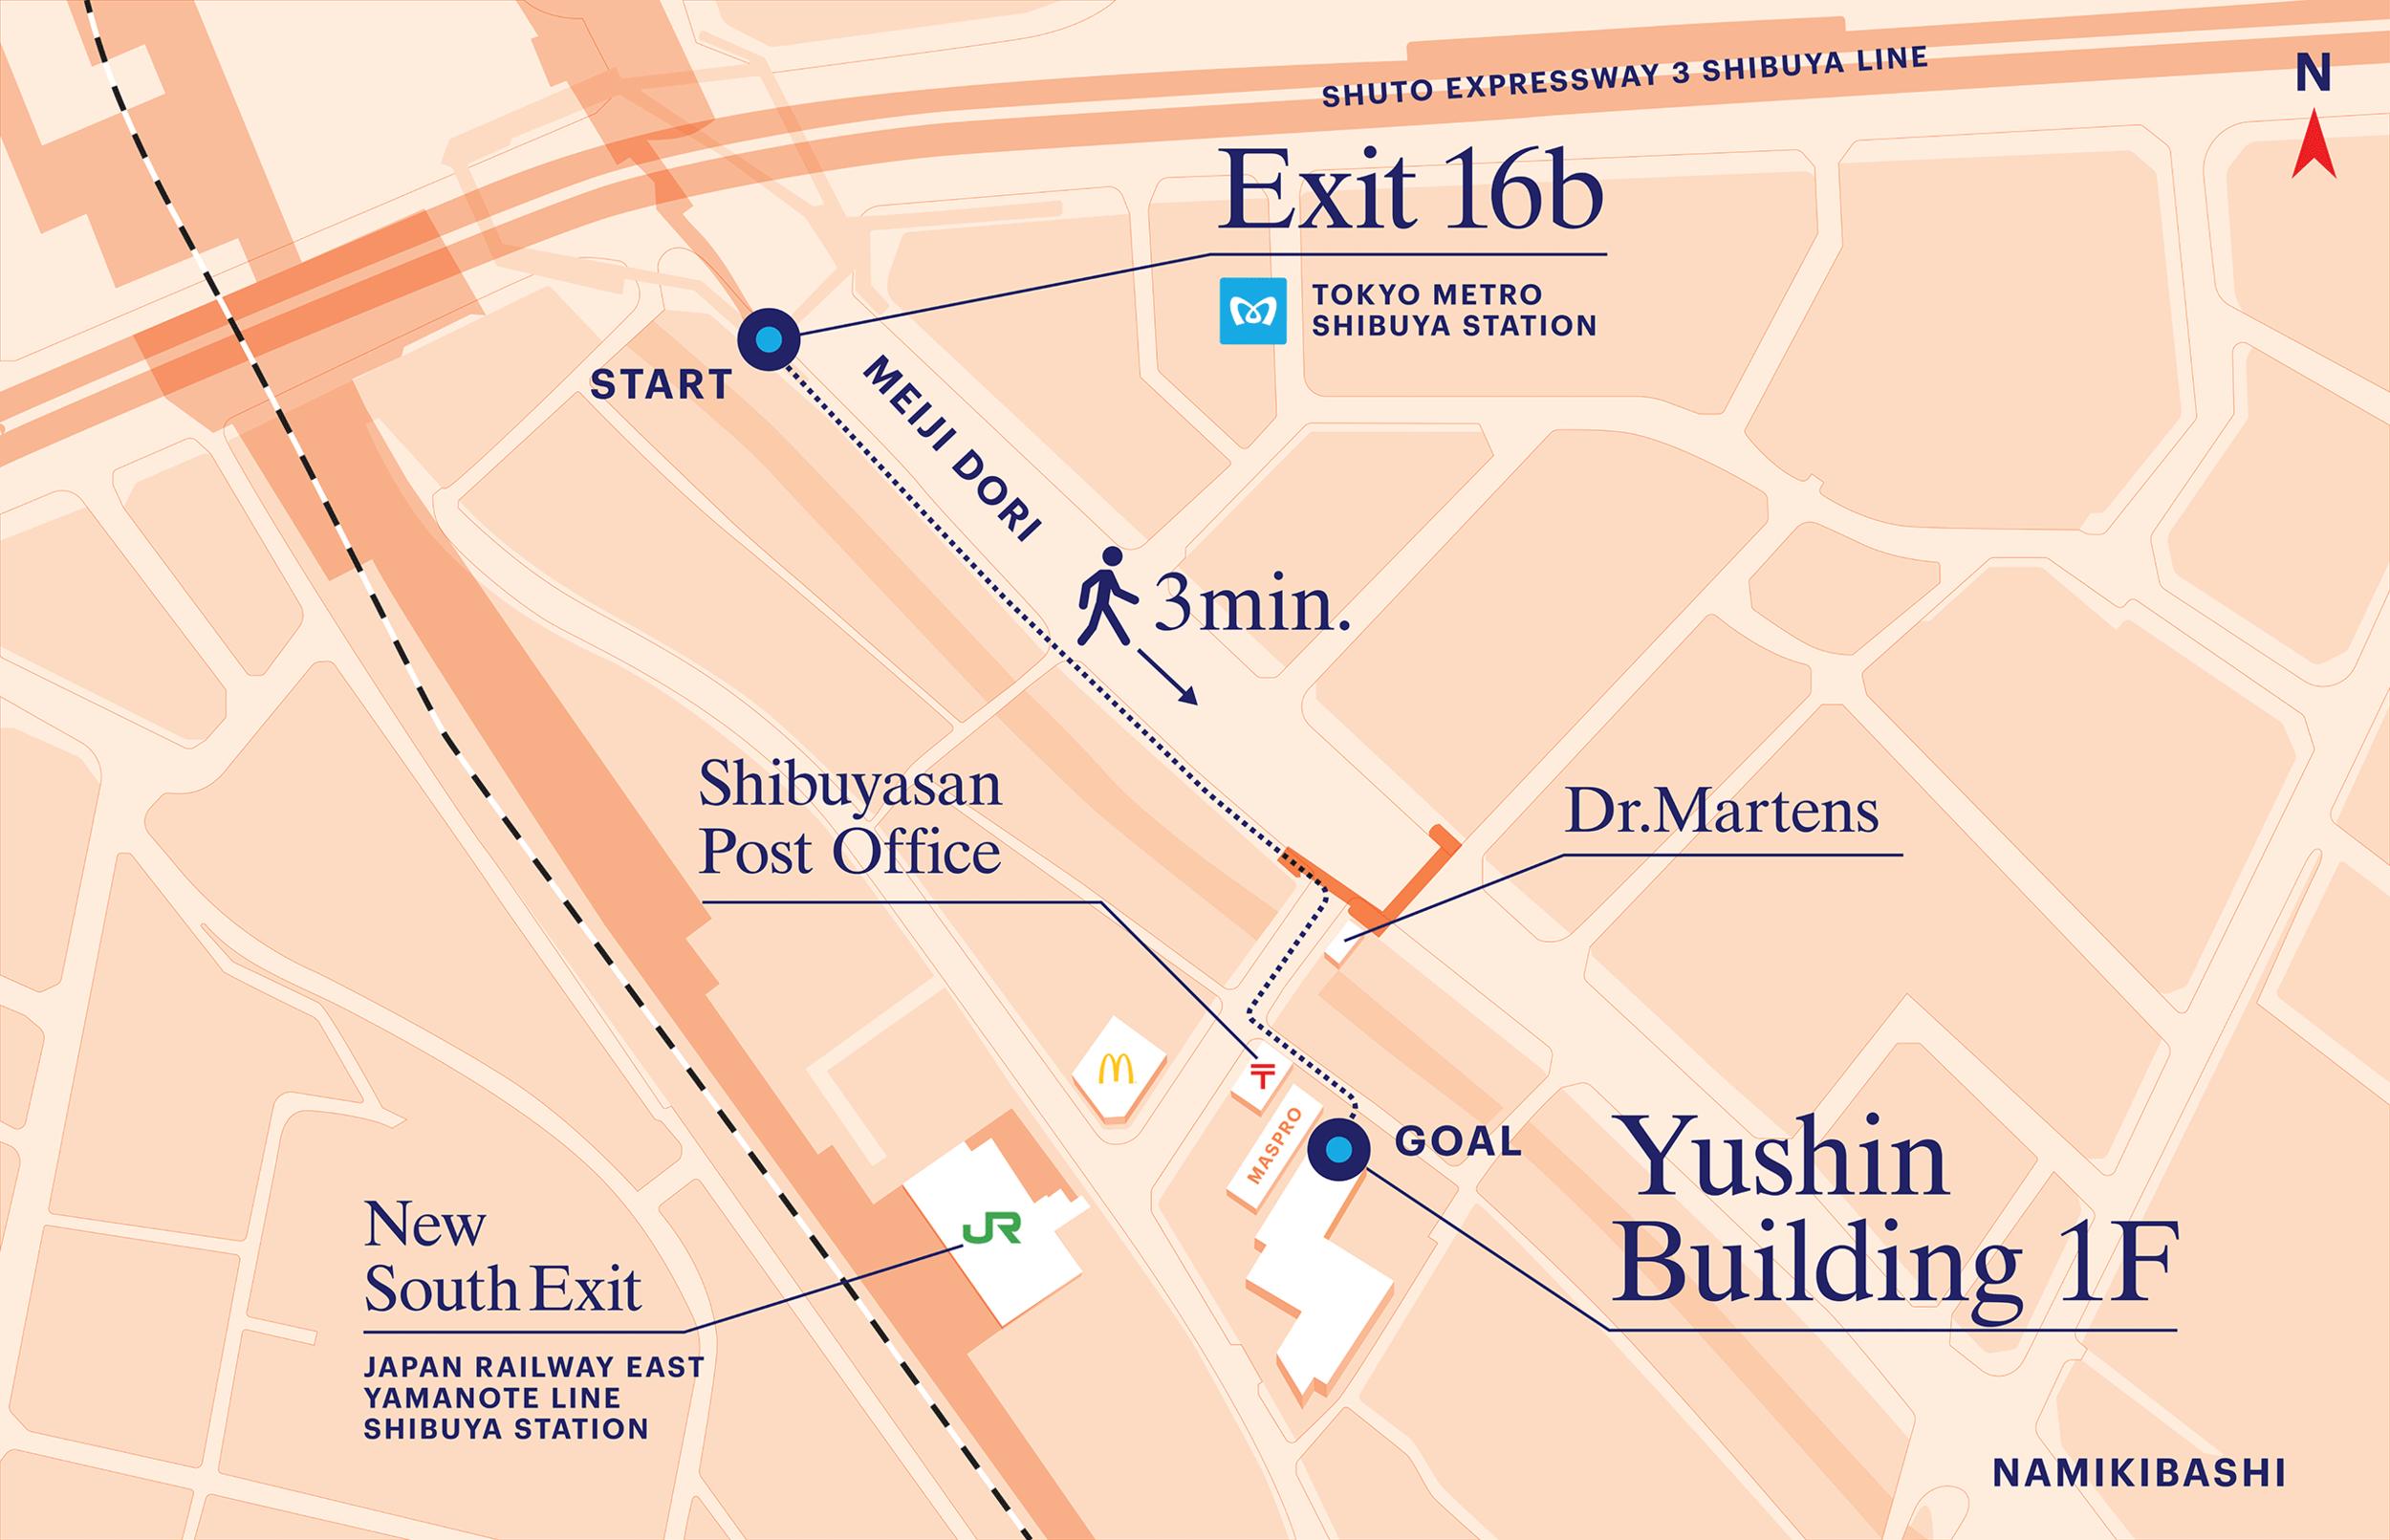 020417_PIA-Tokyo-Map-R-METRO.png